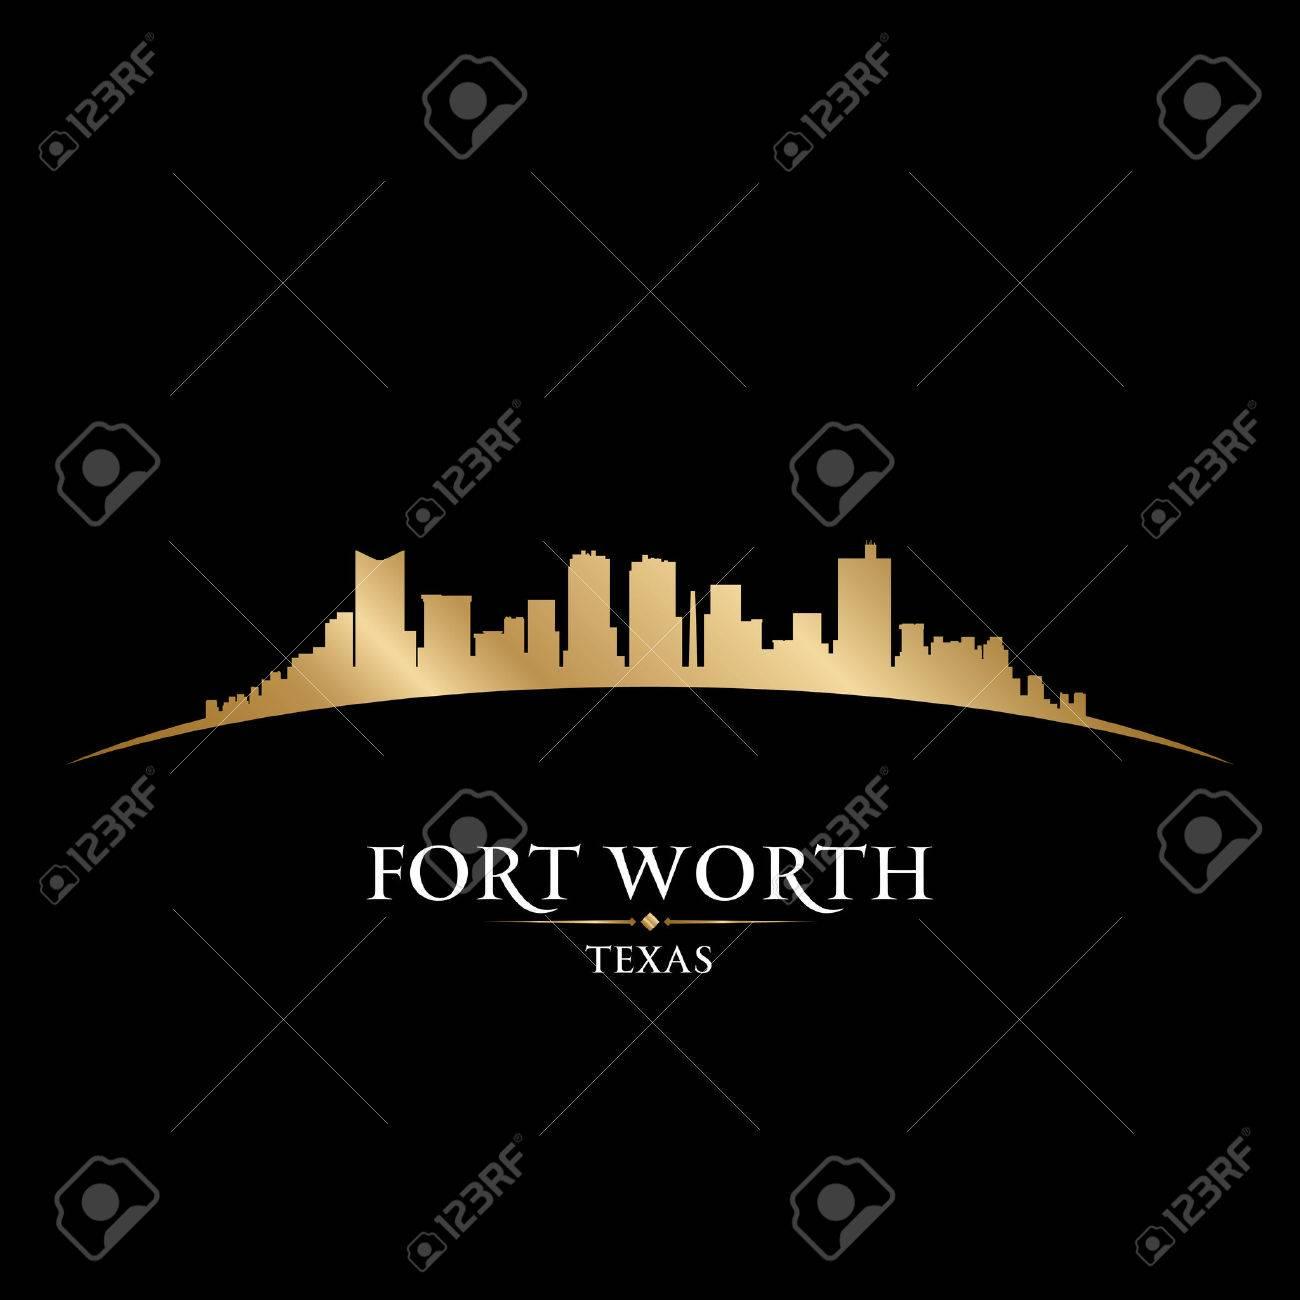 Fort Worth Texas city skyline silhouette. Vector illustration Stock Vector - 22726528